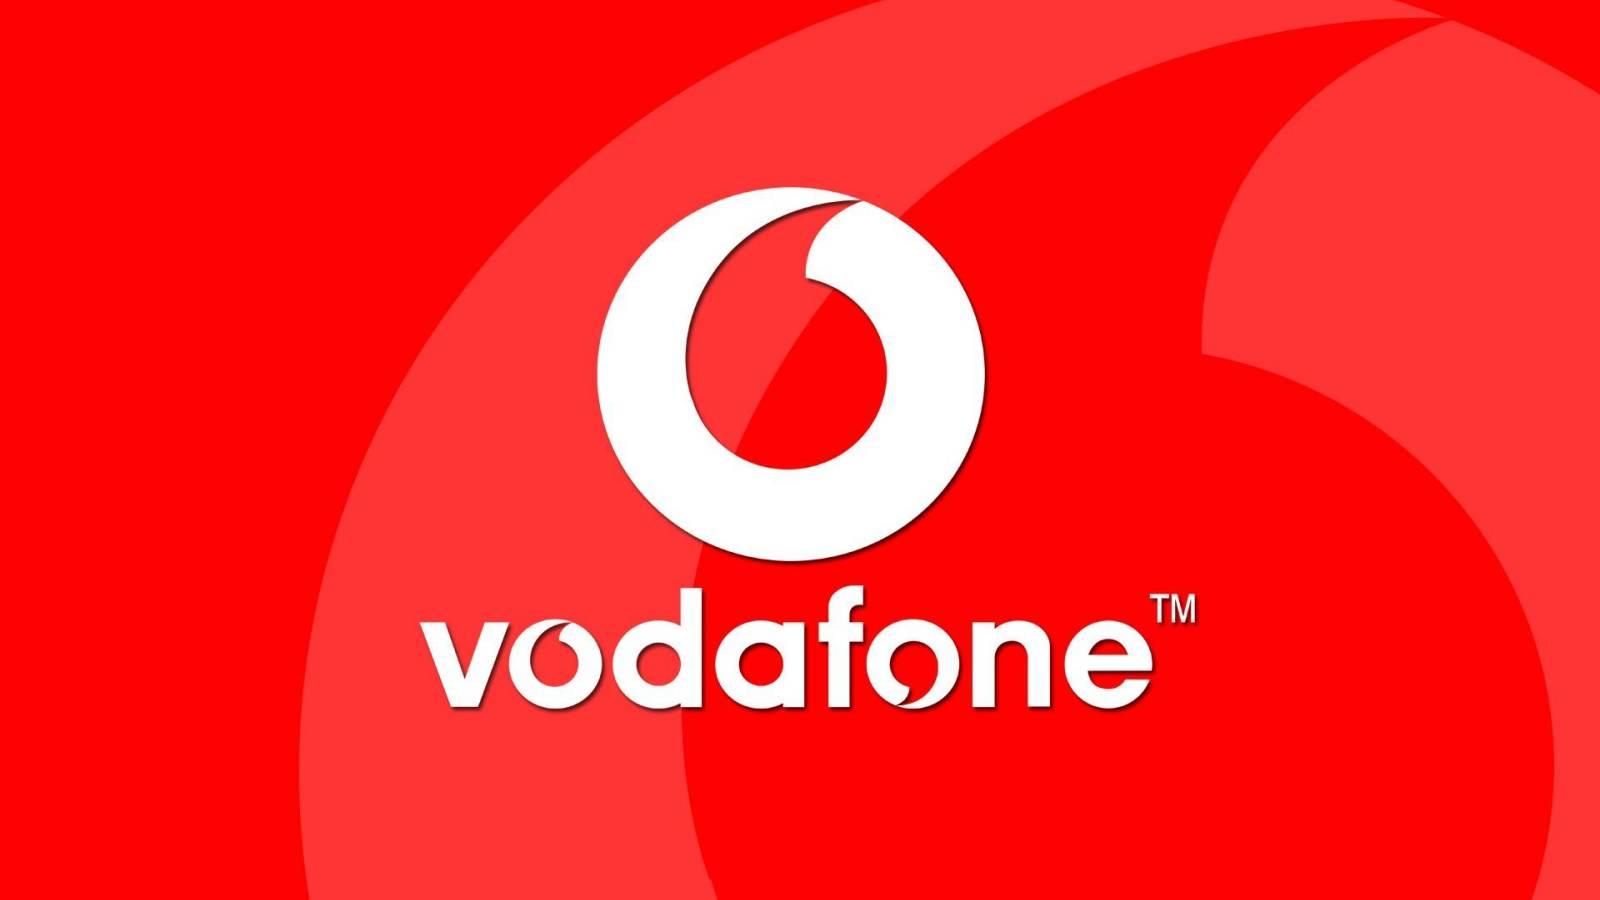 Vodafone tiktok